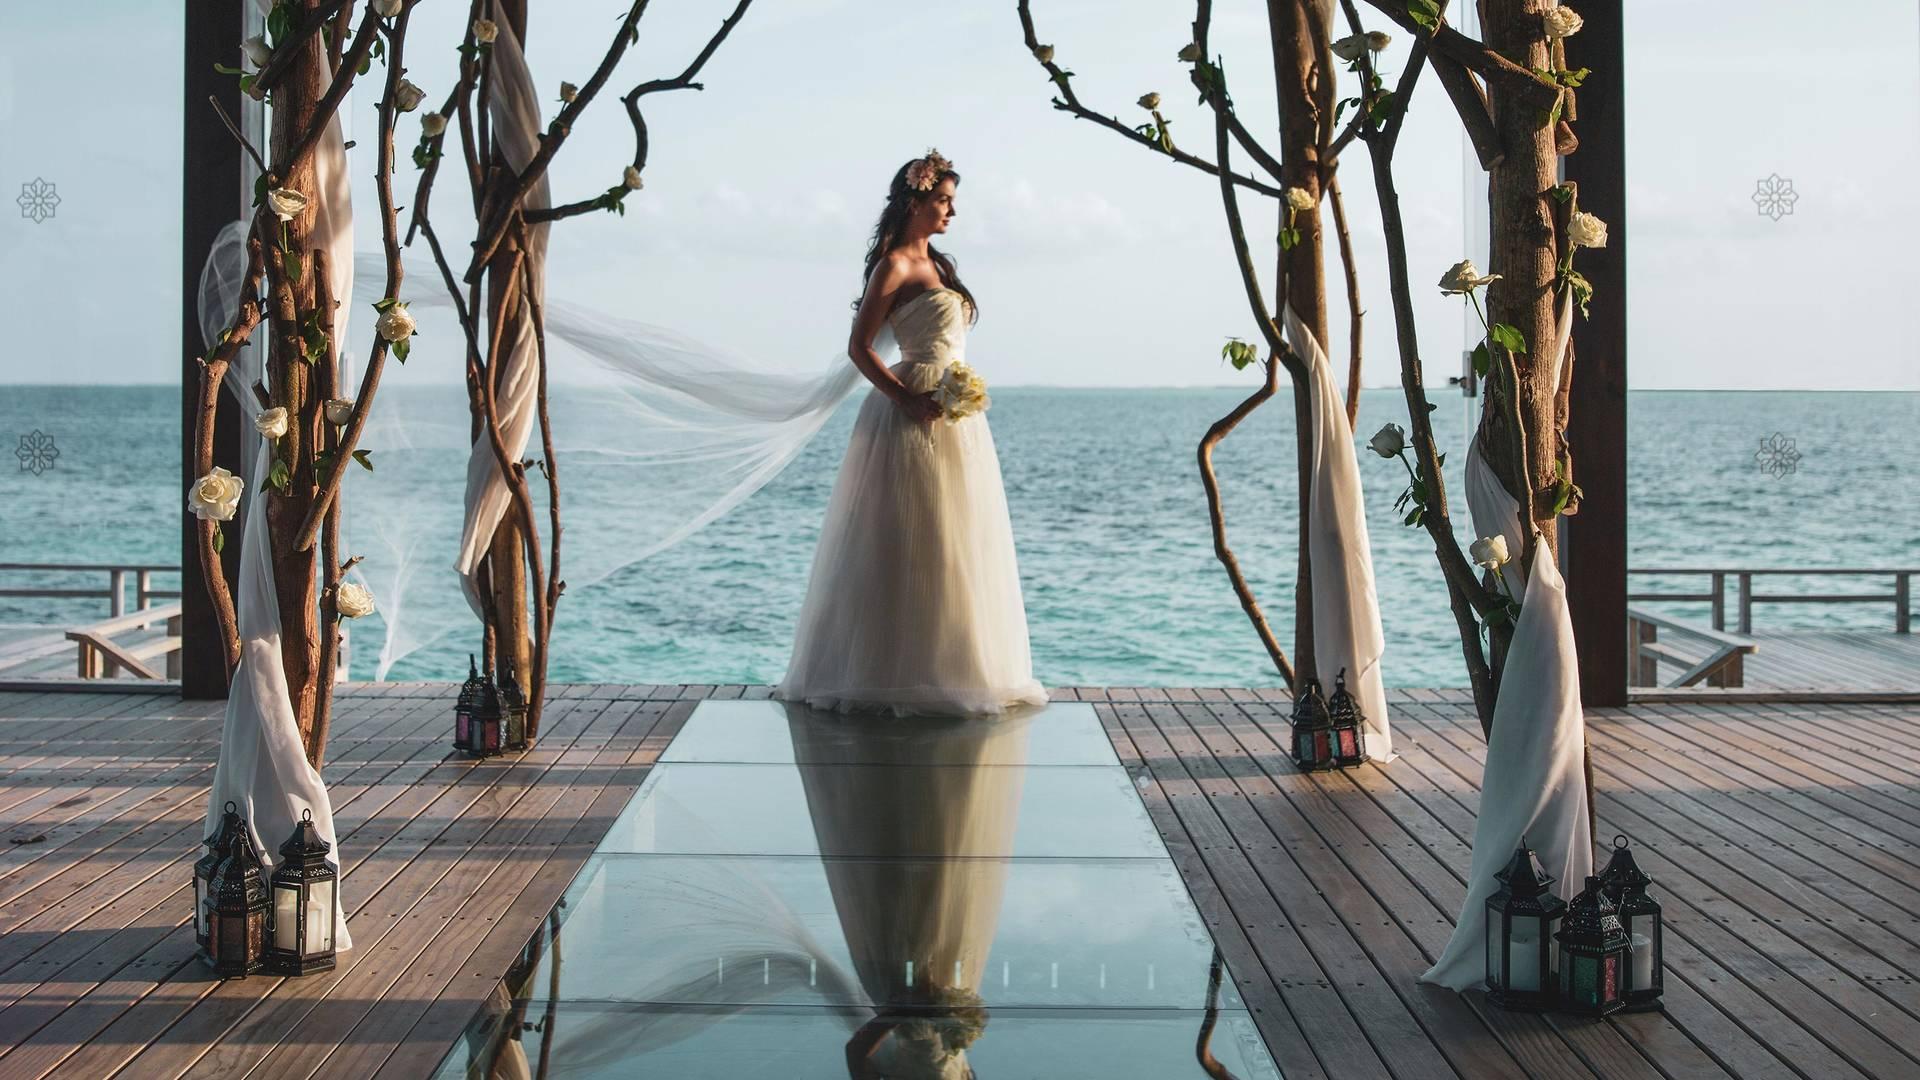 Lady during her wedding at Jumeirah Vittaveli hotel